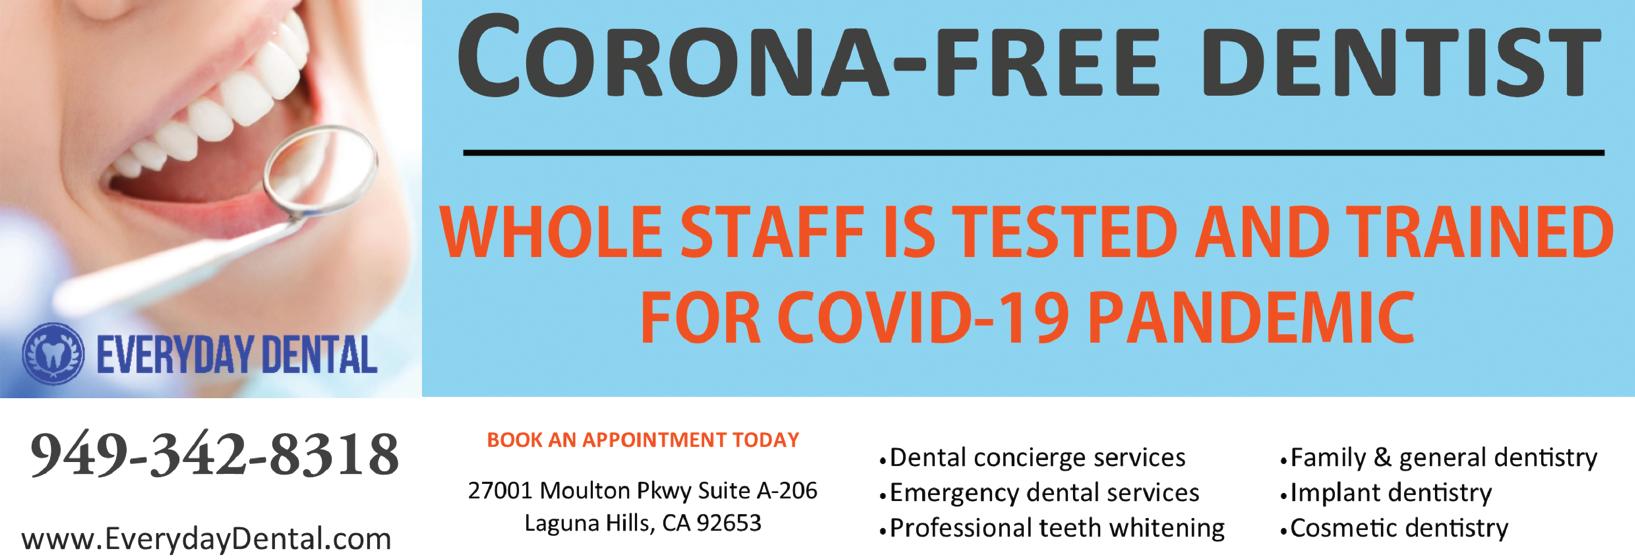 everyday dental laguna hills ca logo dentist coupons near me